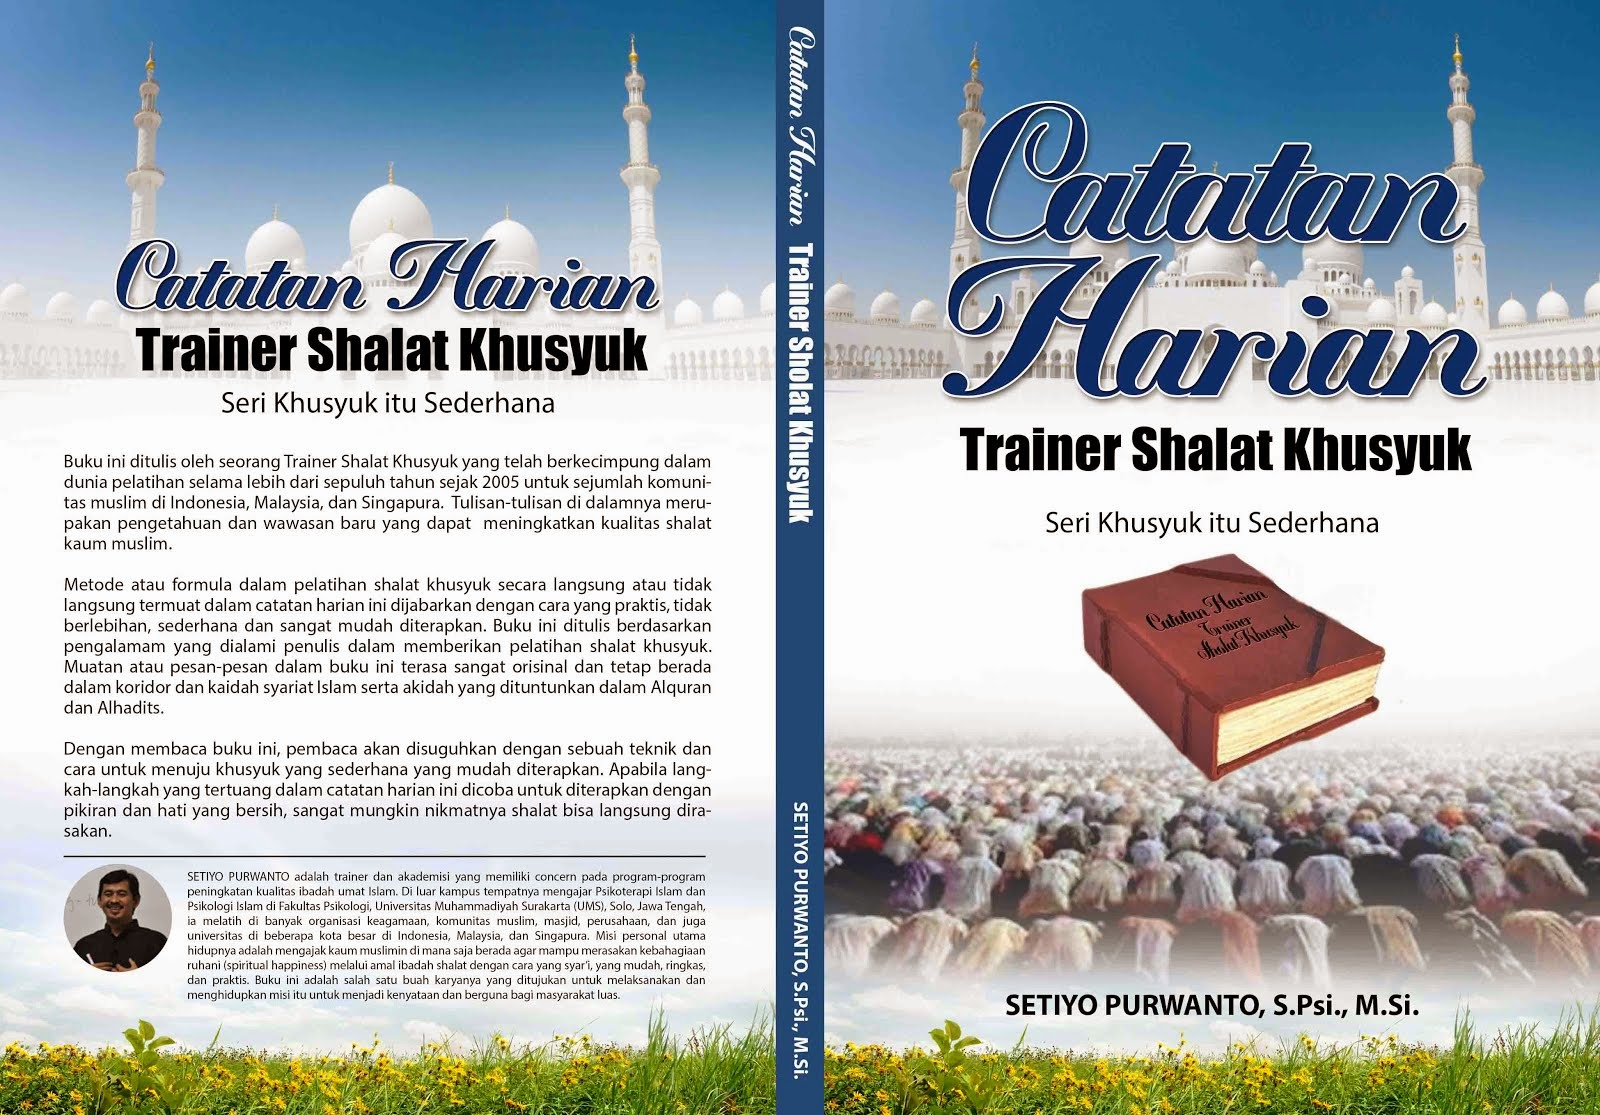 Buku Catatan Trainer Shalat Khusyuk